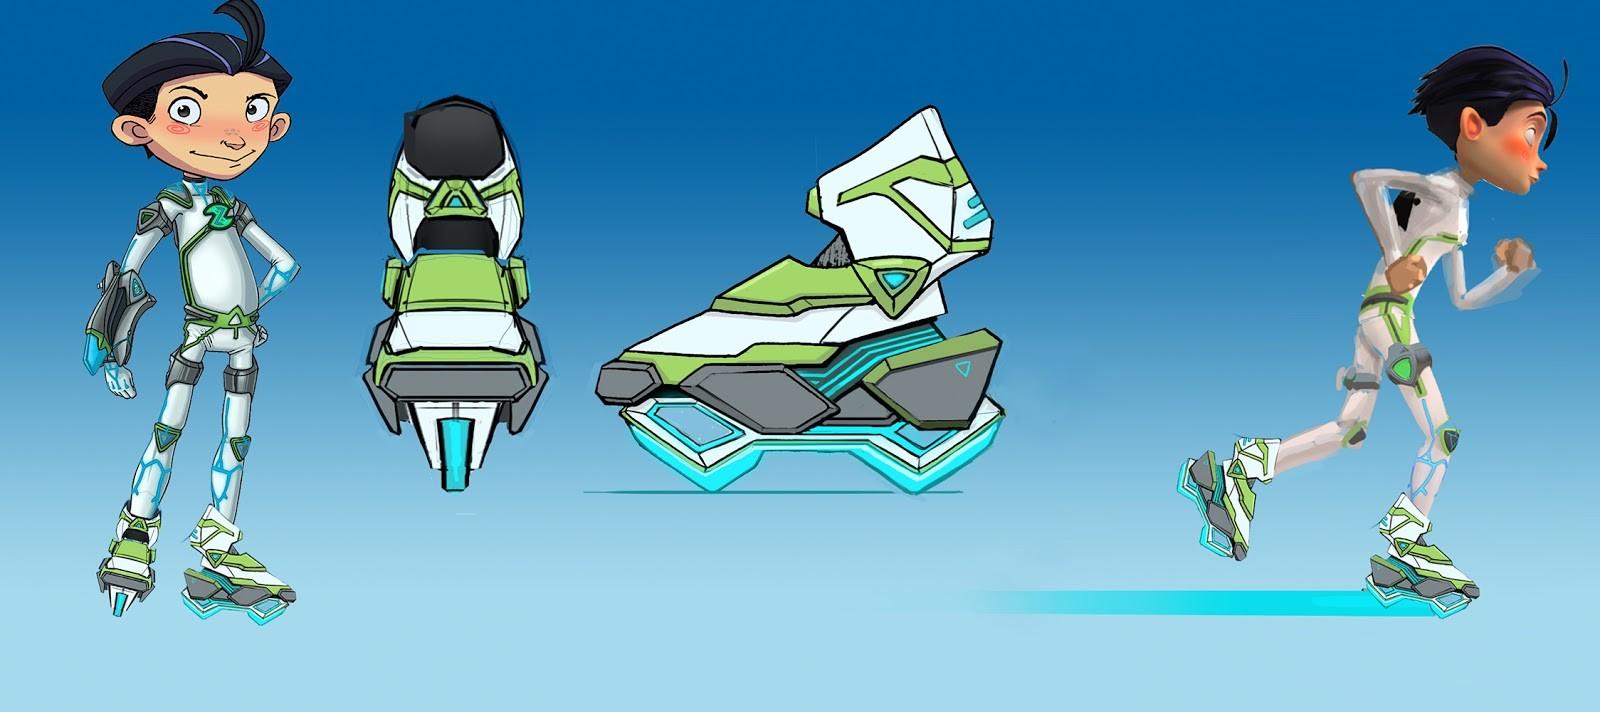 Jose cua skate jet boots 01